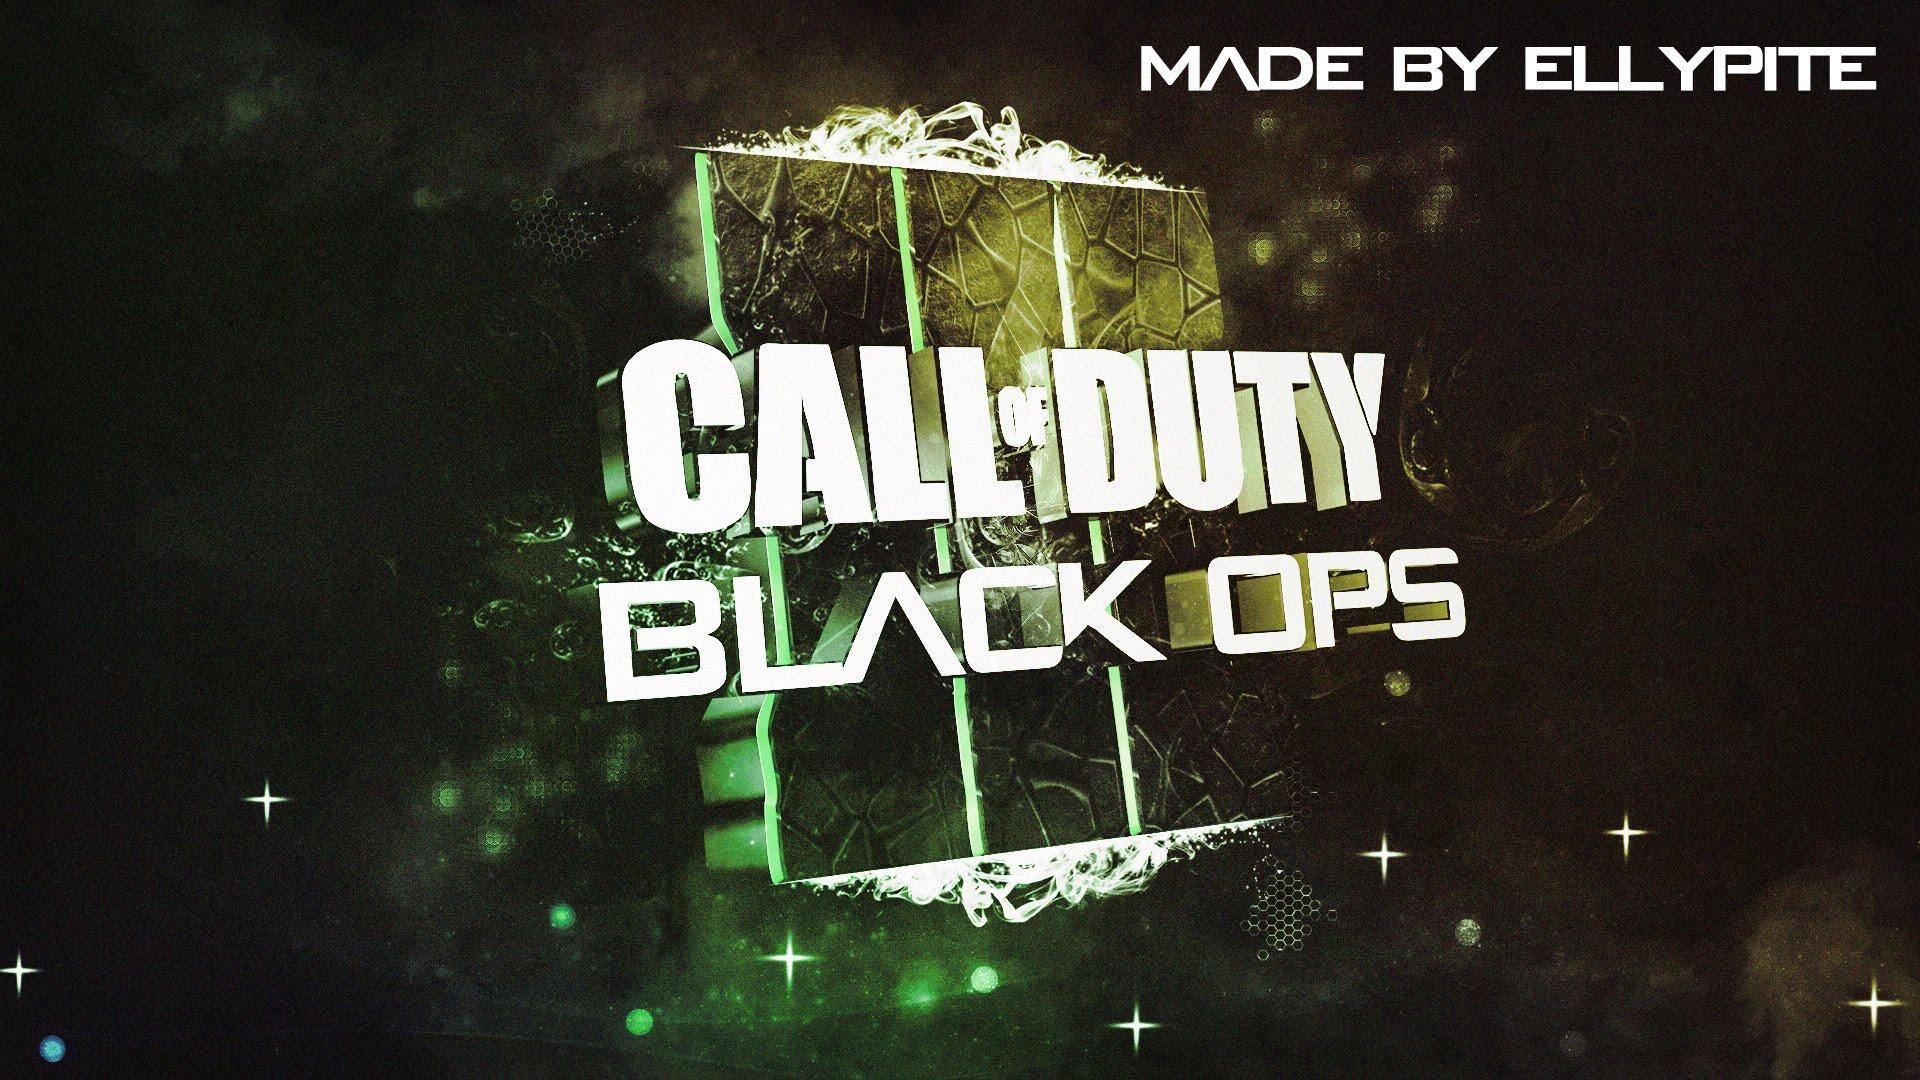 Call of Duty Black Ops 3   Wallpaper [SpeedArtHD] 1920x1080